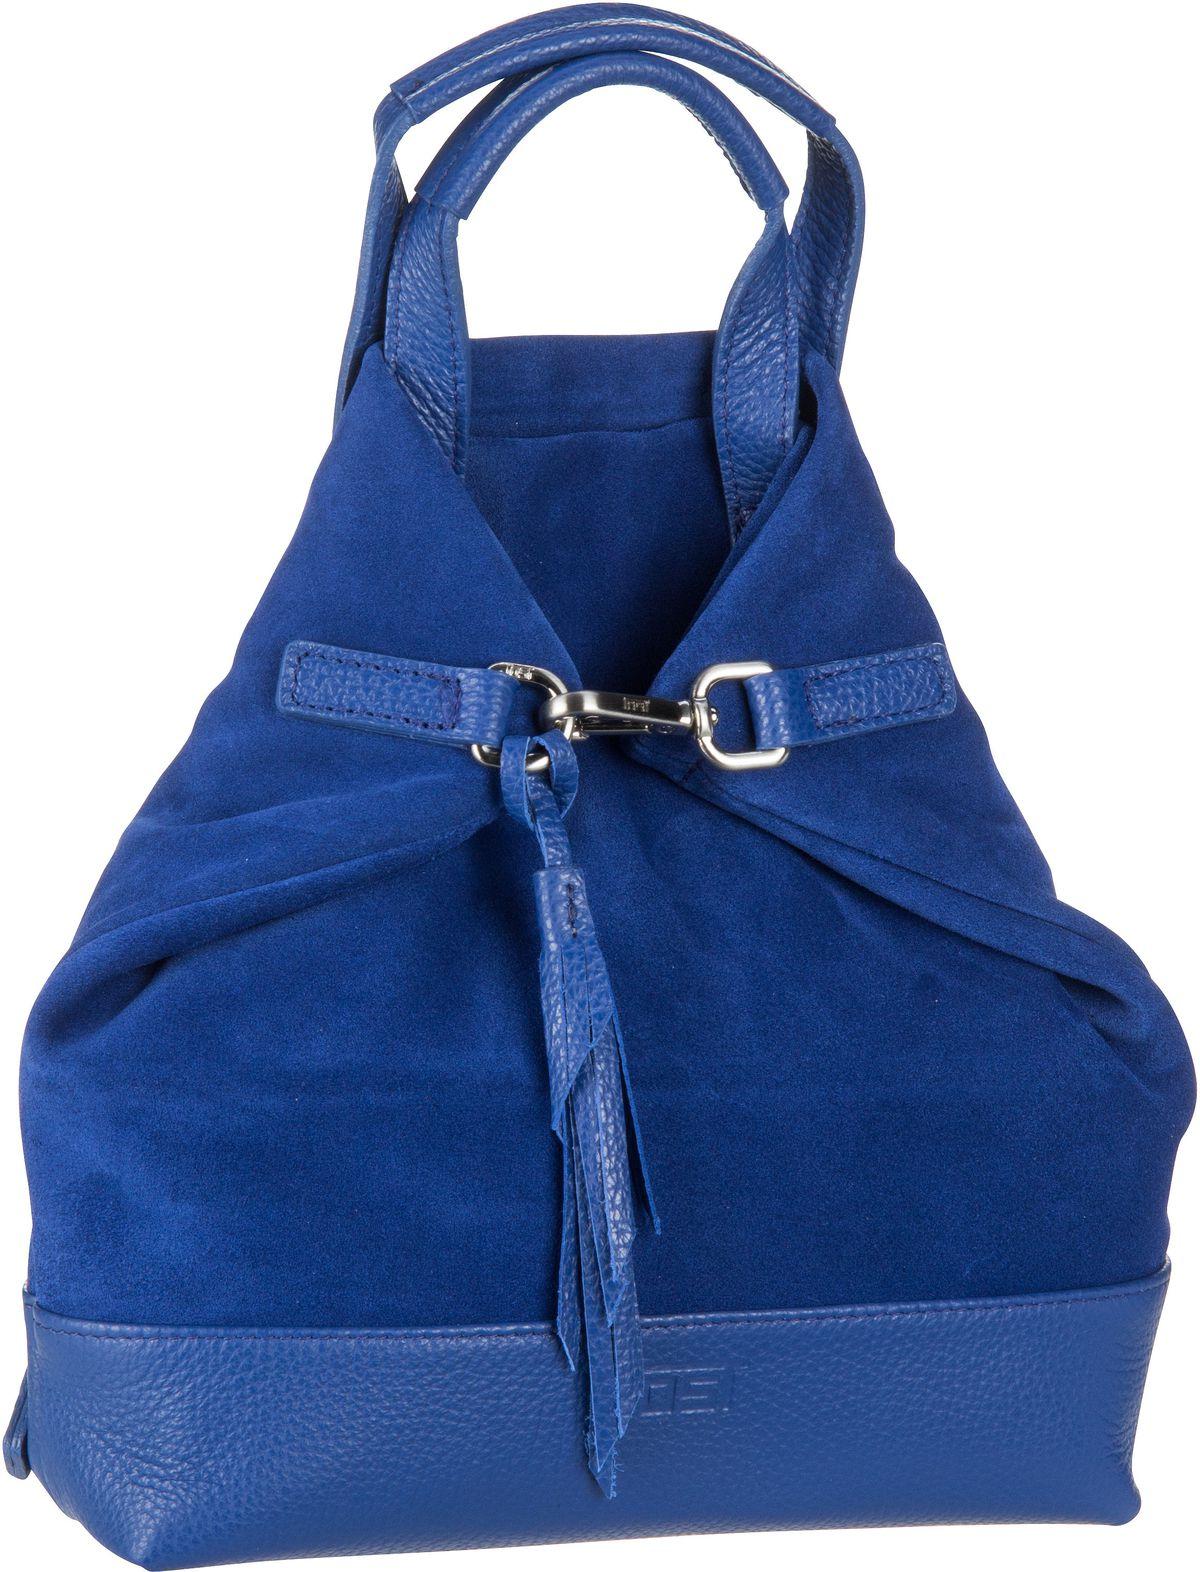 Rucksack / Daypack Motala 1744 X-Change Bag Mini Royalblue